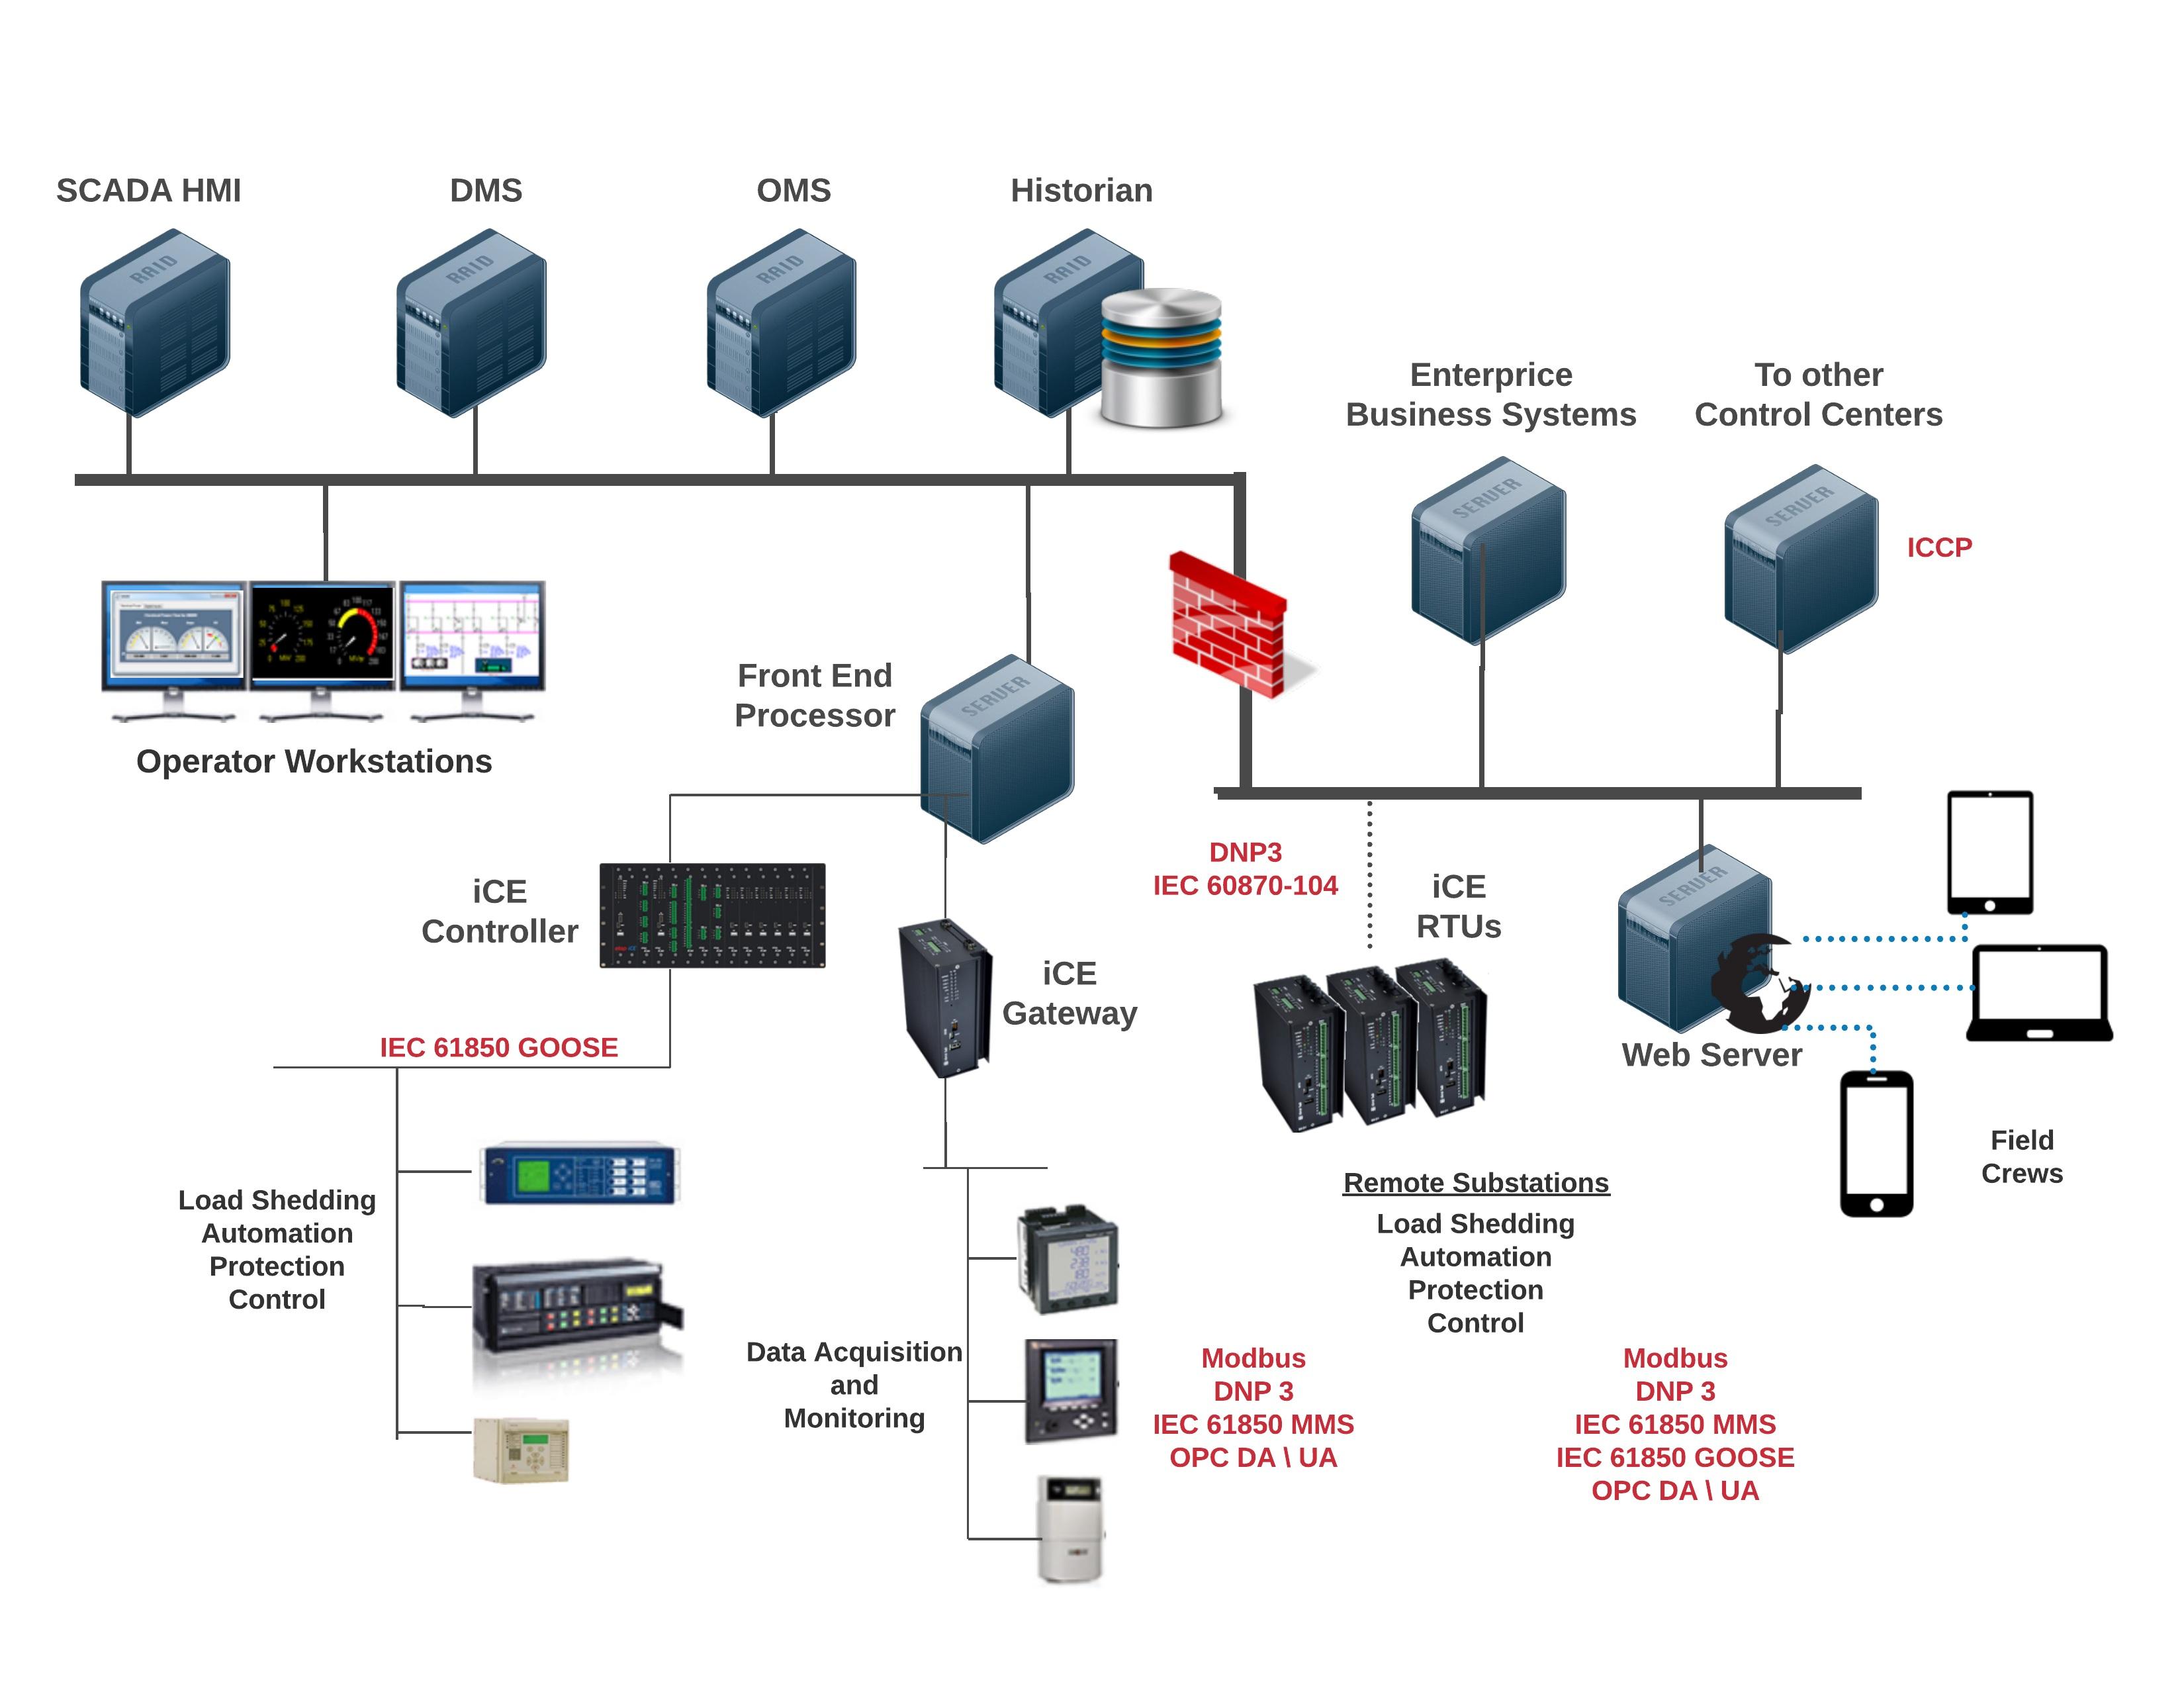 SCADA System Architecture